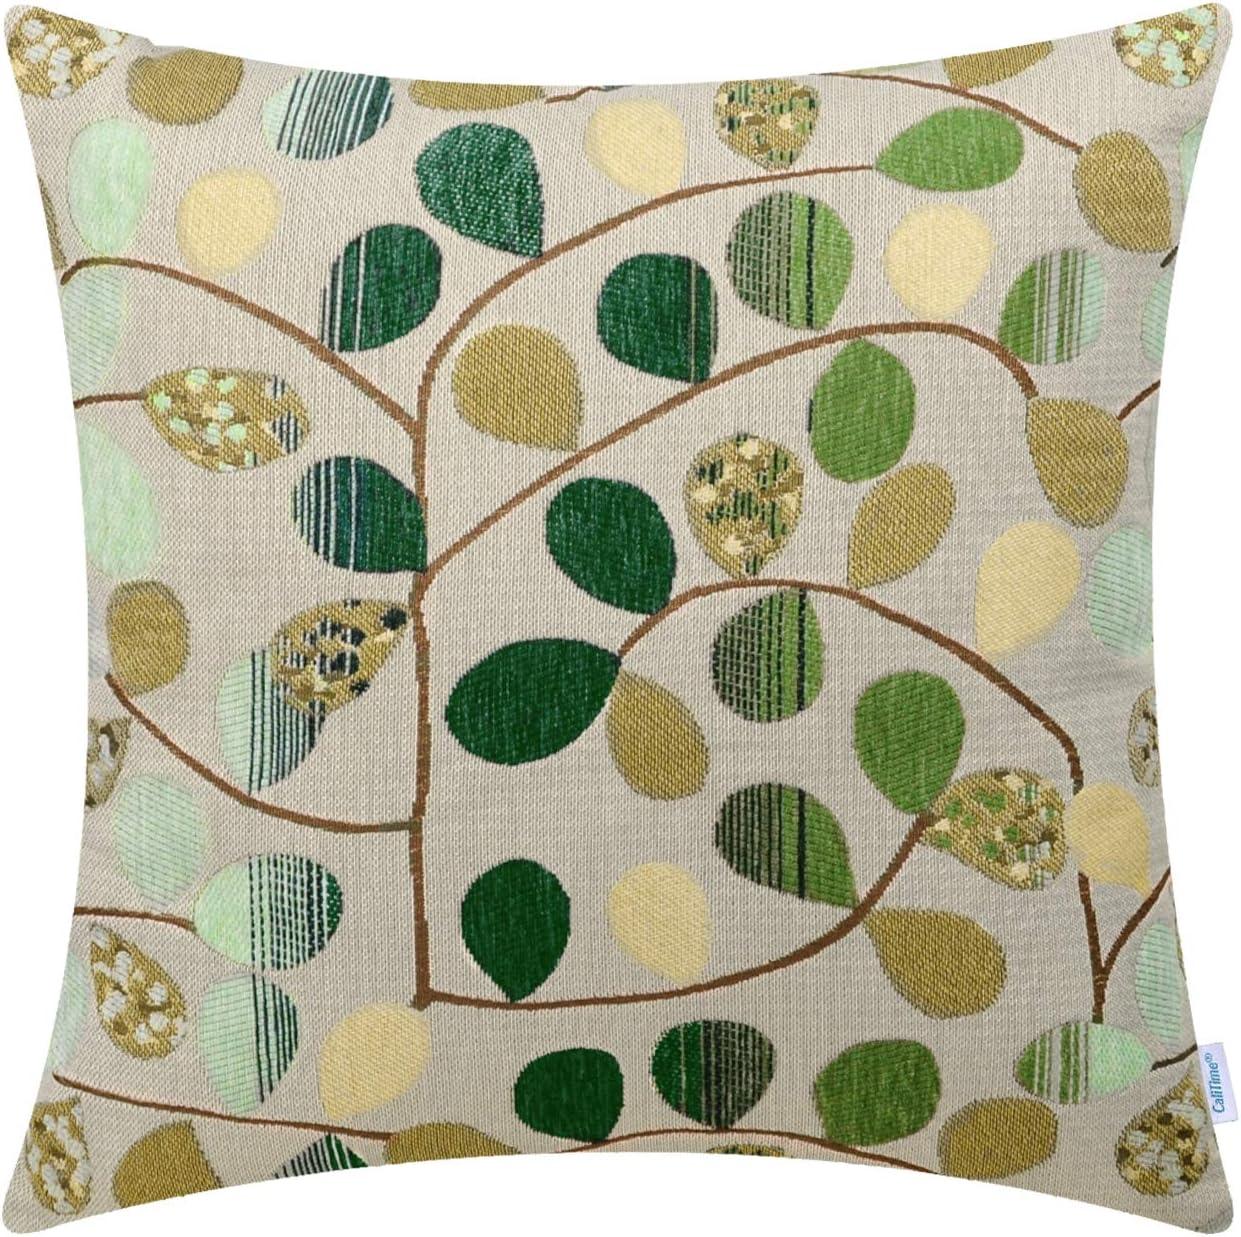 CaliTime Cushion Cover Pillow Case Luxury Chenille Leaves Car Sofa Decor 50x50cm